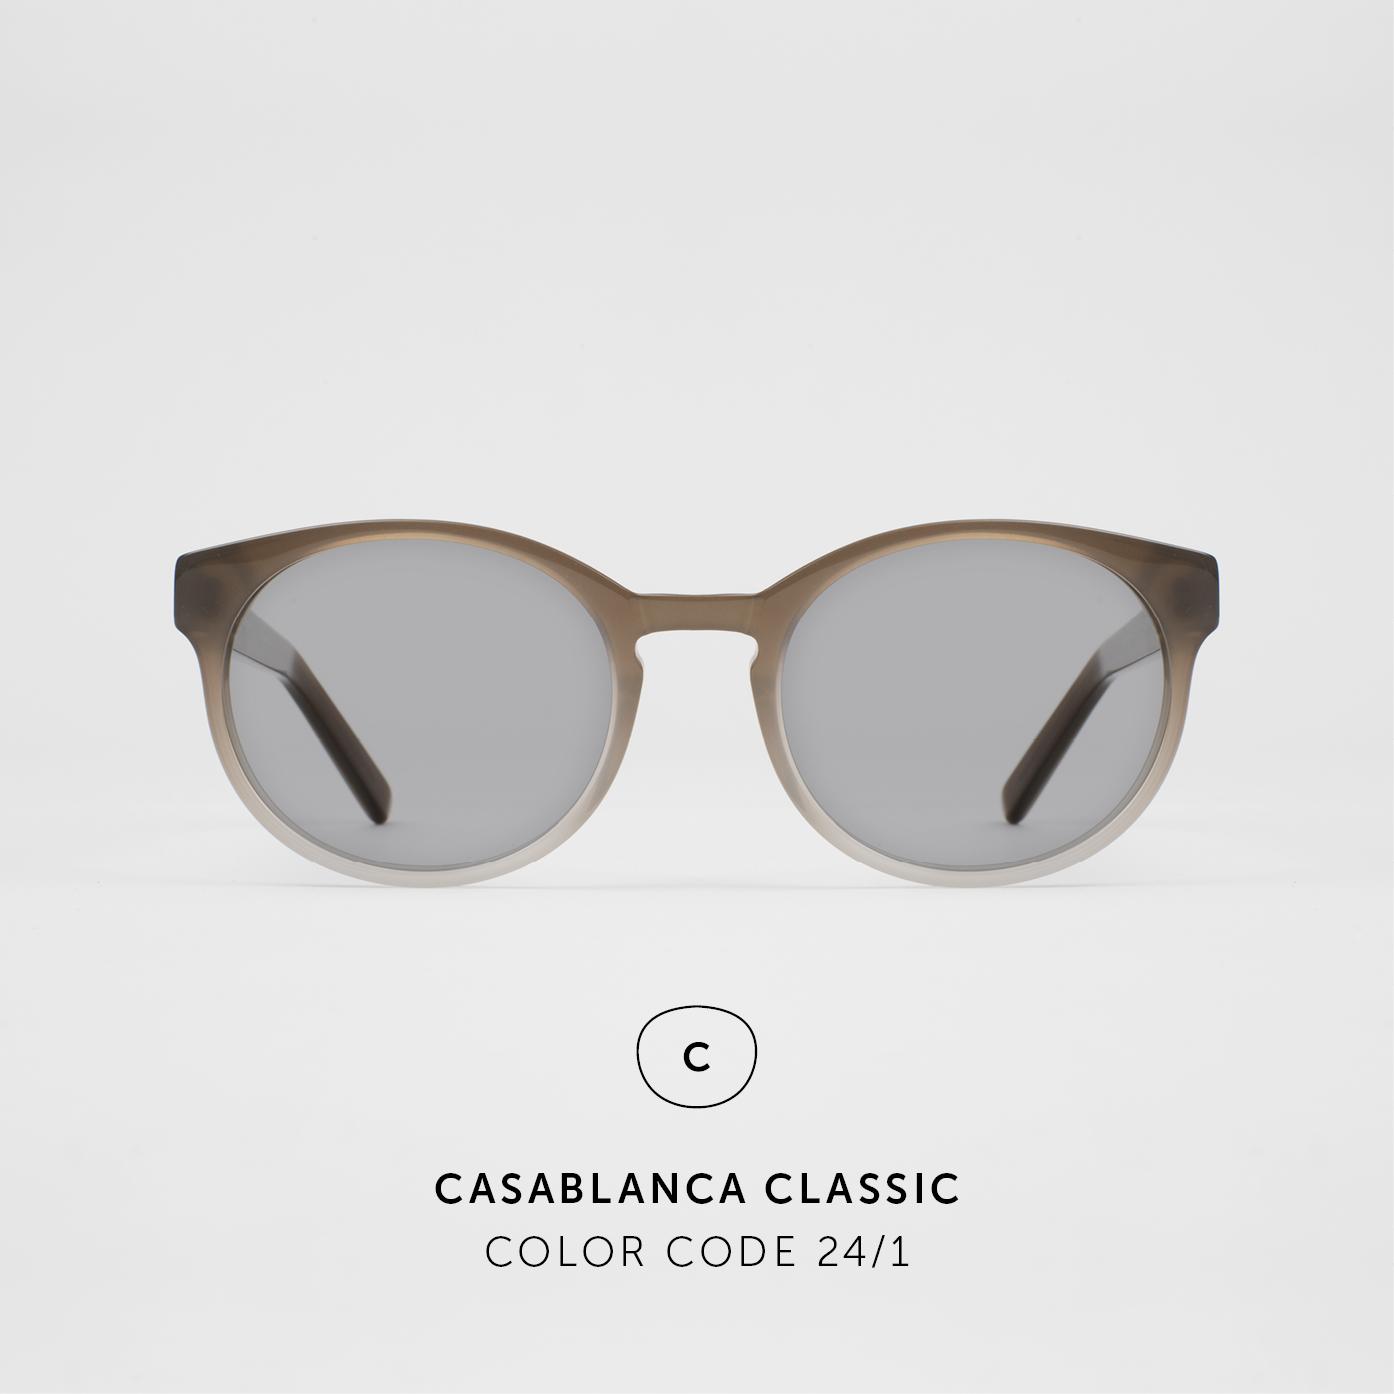 CasablancaClassic59.jpg